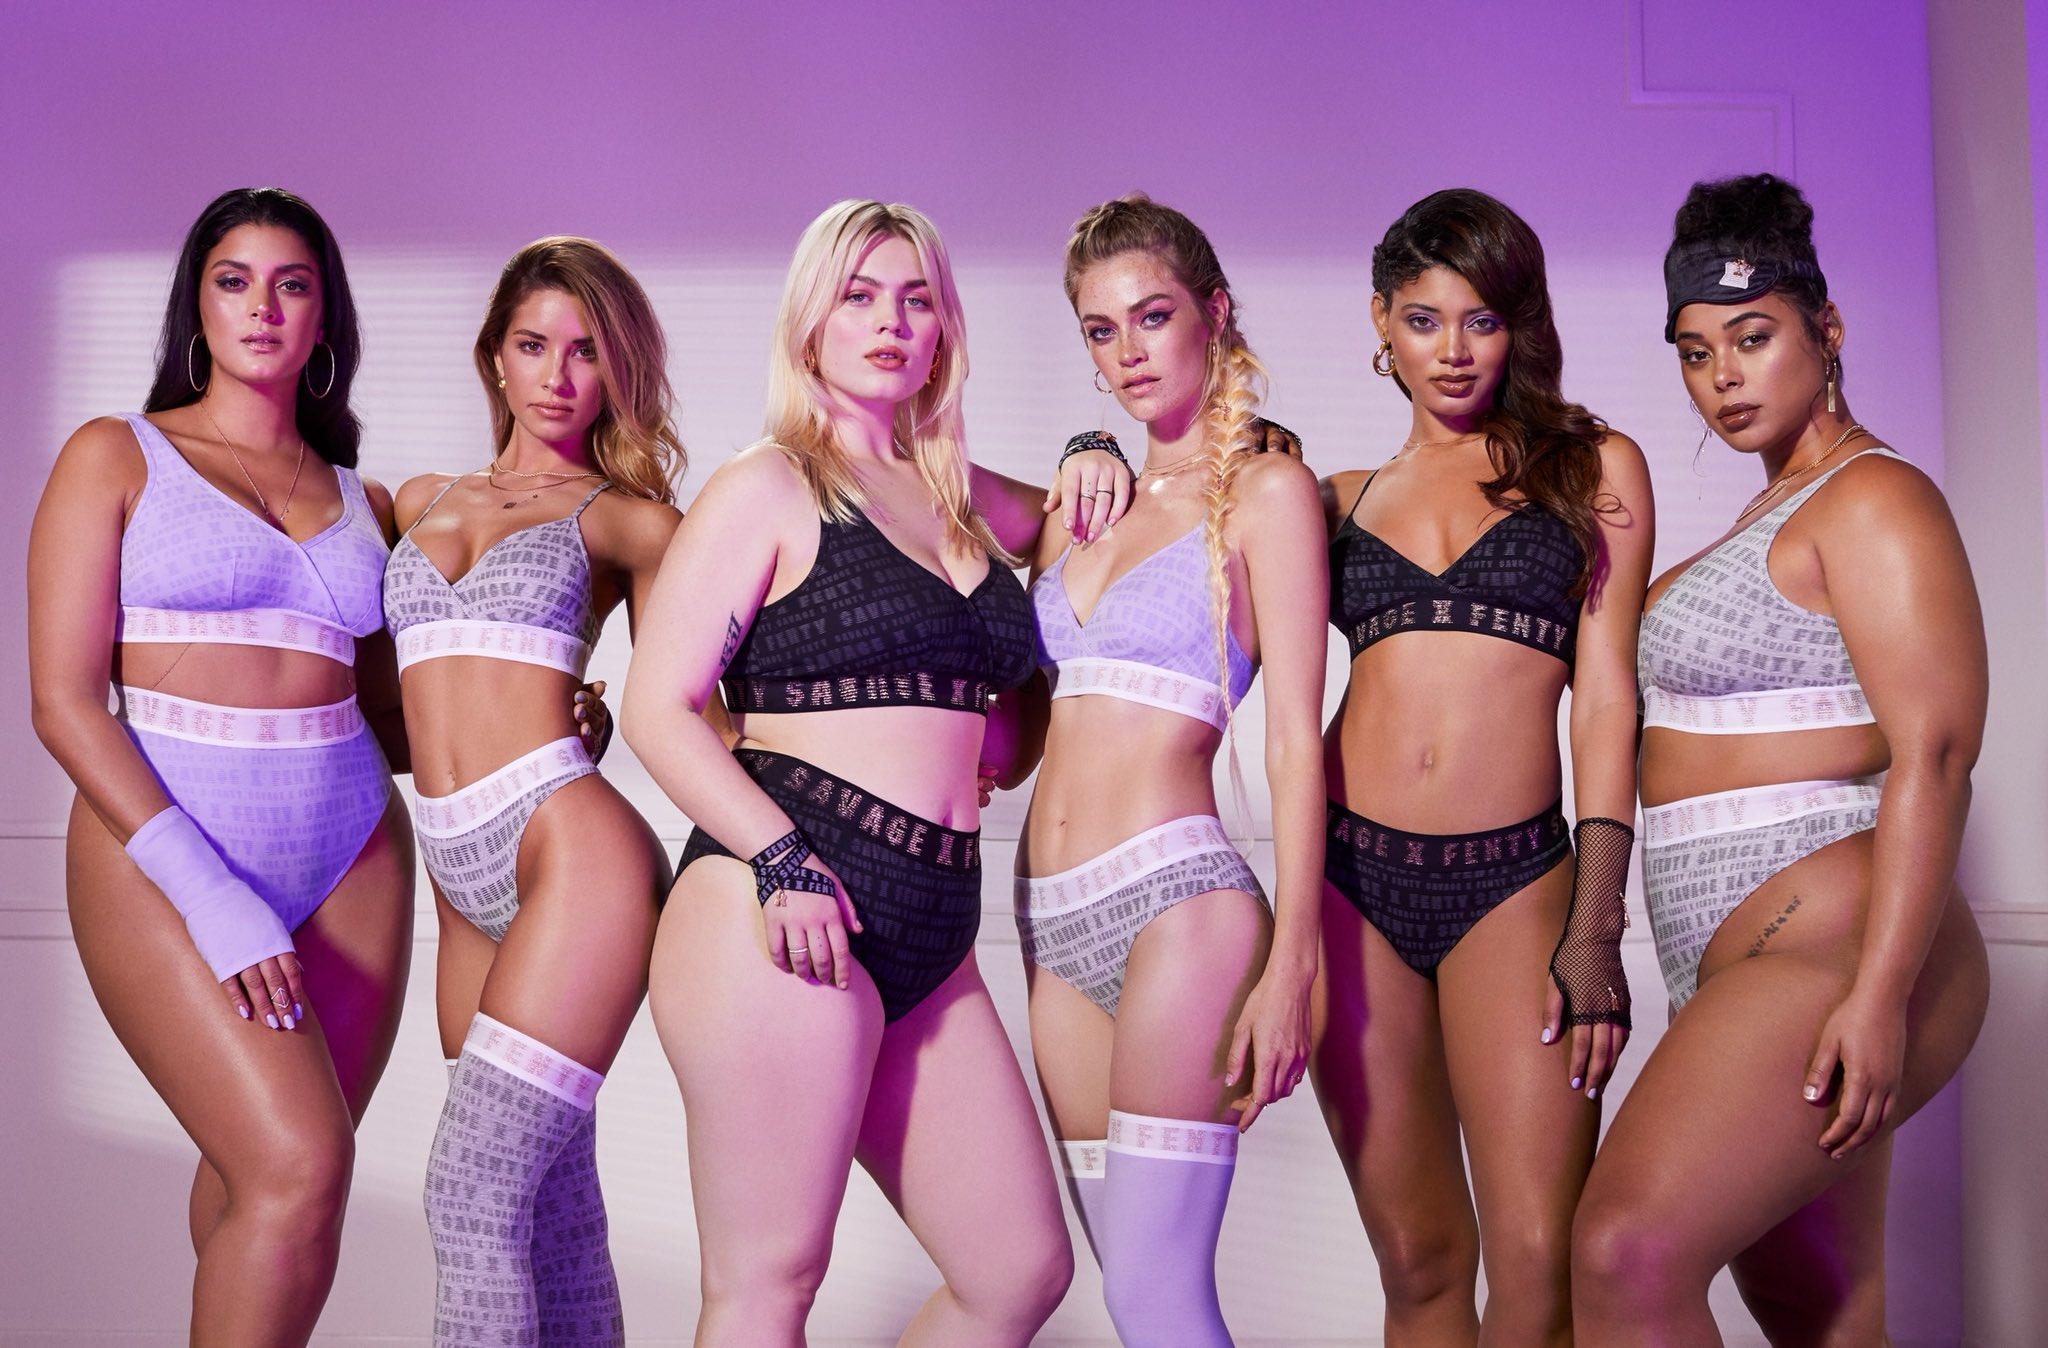 savagexfenty-rihanna-lingerie-size inclusivity